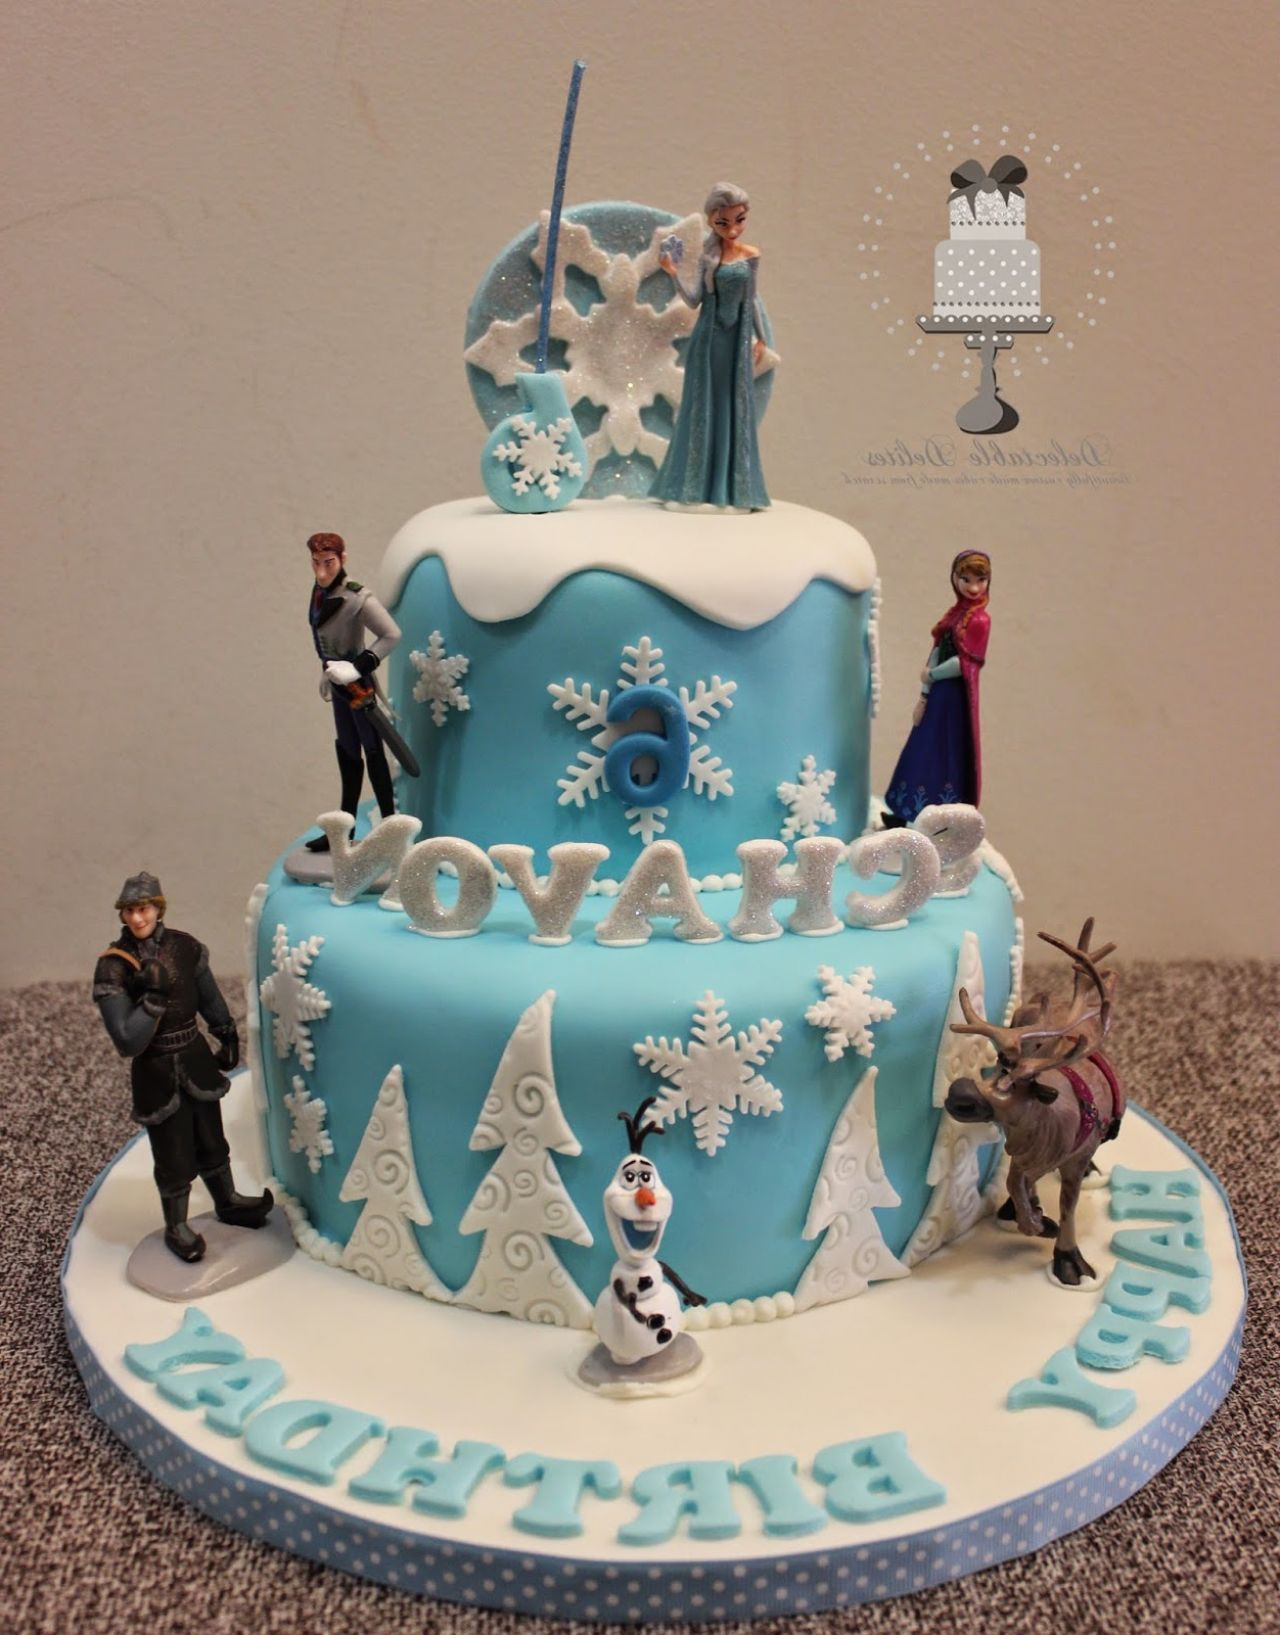 Disney Frozen Birthday Cake Pans